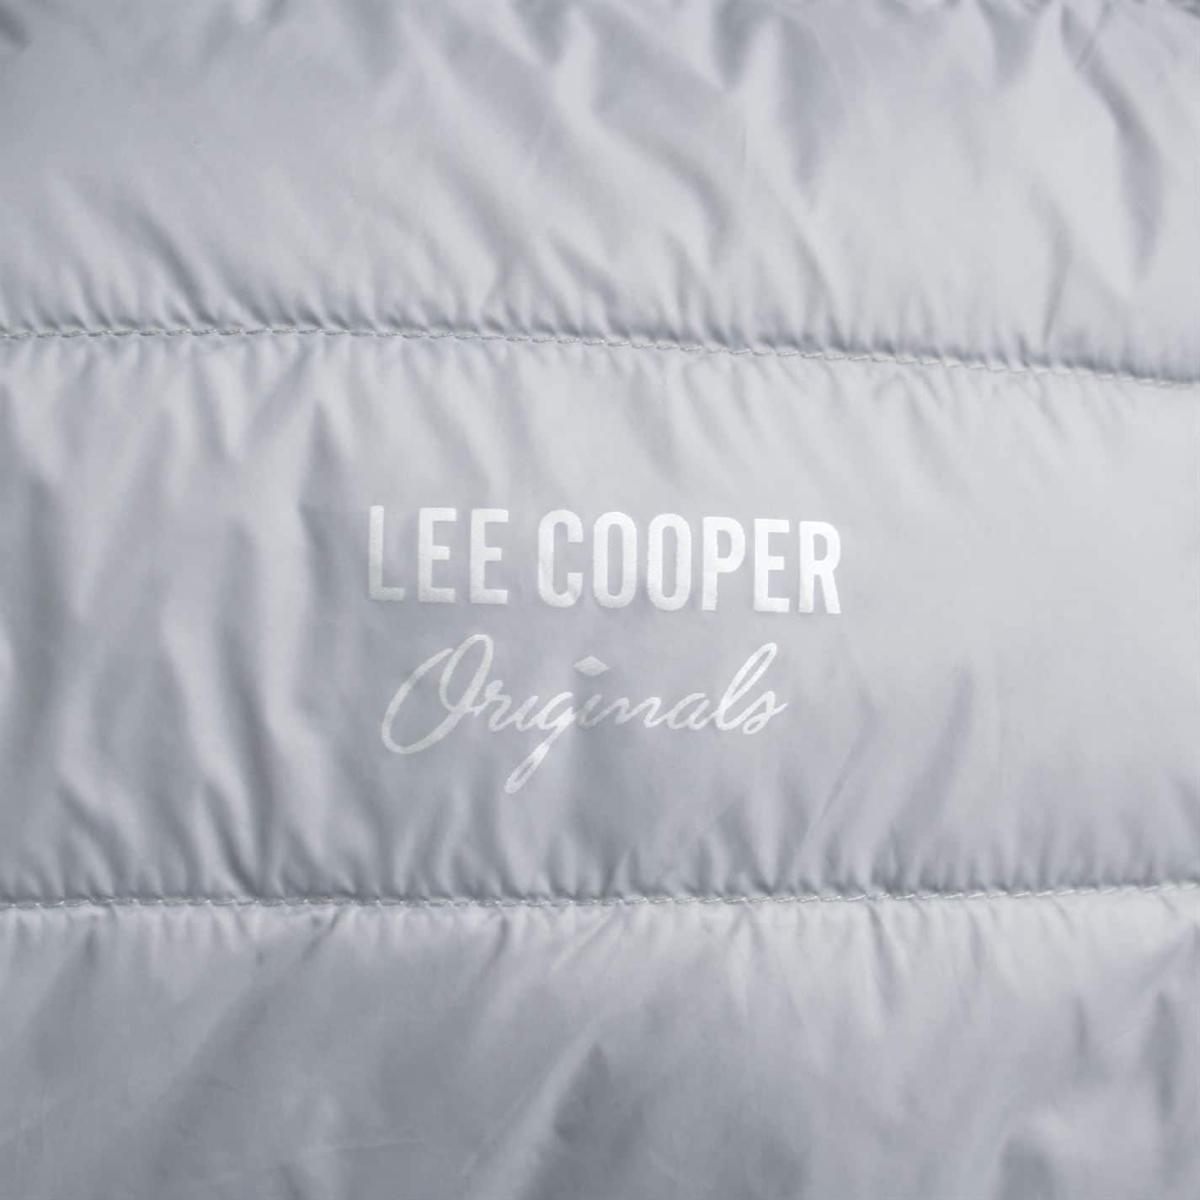 Lee Cooper Xlite Down Winterjacke Jacke Herren Grau